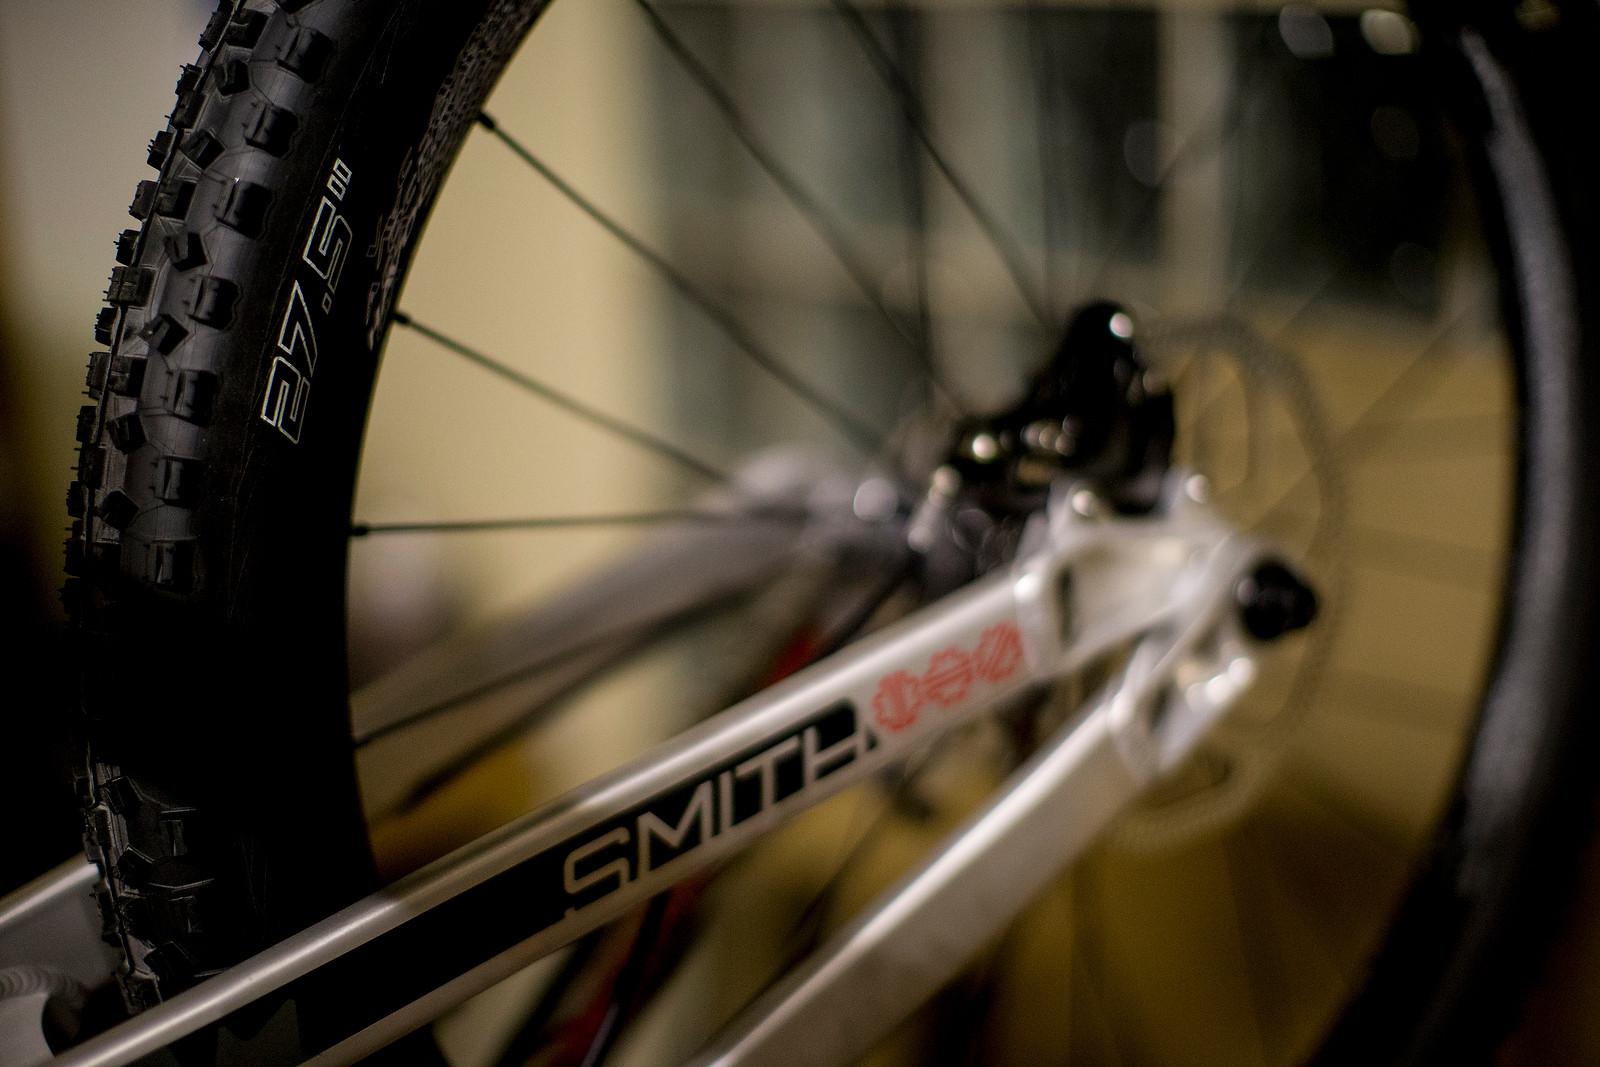 Steve Smith's Prototype 27.5 Bike Rear End - World Championships Bikes and Gear 2013 - Mountain Biking Pictures - Vital MTB